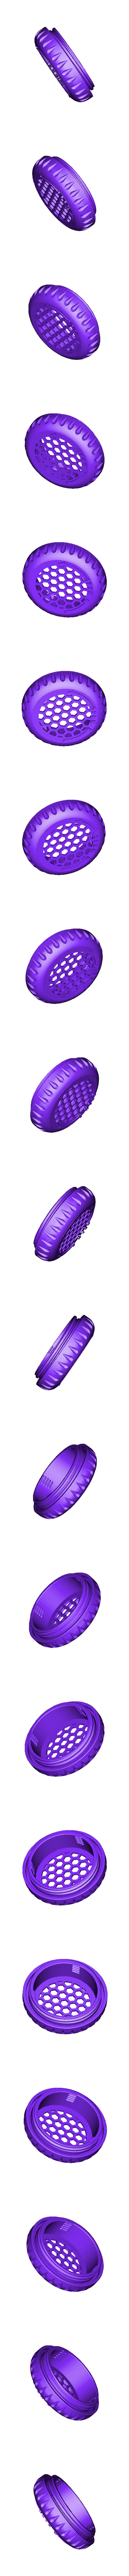 Tapa Ventilador R.stl Download free STL file #3DvsCOVID19 Mask with Fans for Air I/O. • 3D printer design, alonsothander